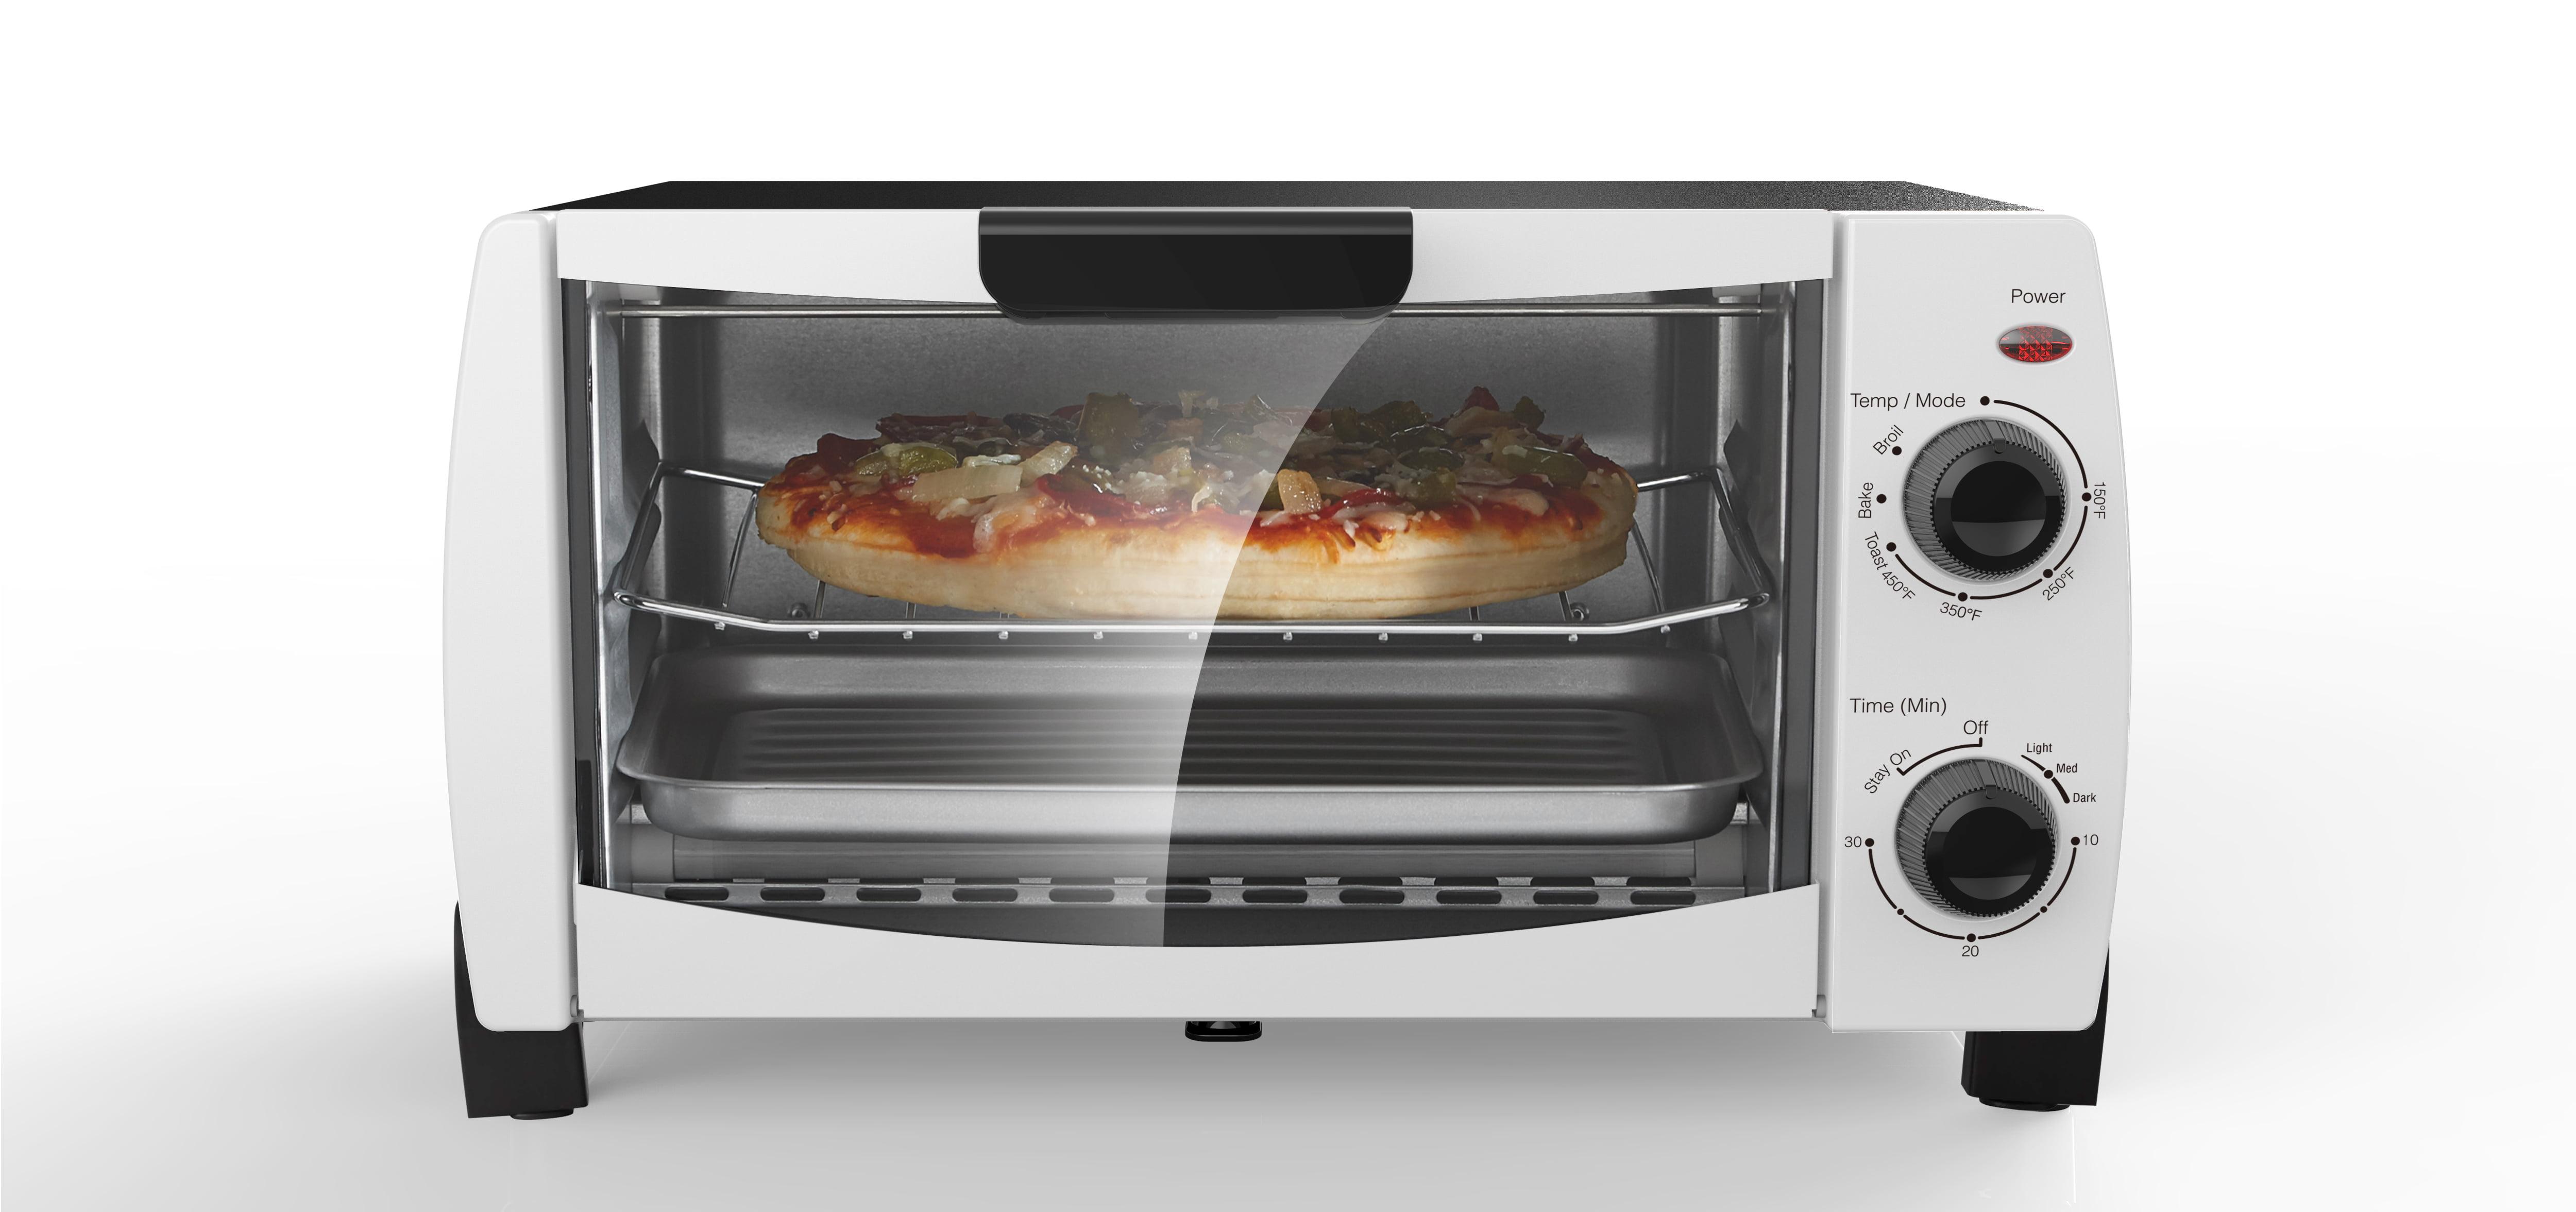 dp breville oster kitchenaid slice slot cuisinart amazon ca bread long home decker toast black kitchen toaster industrial